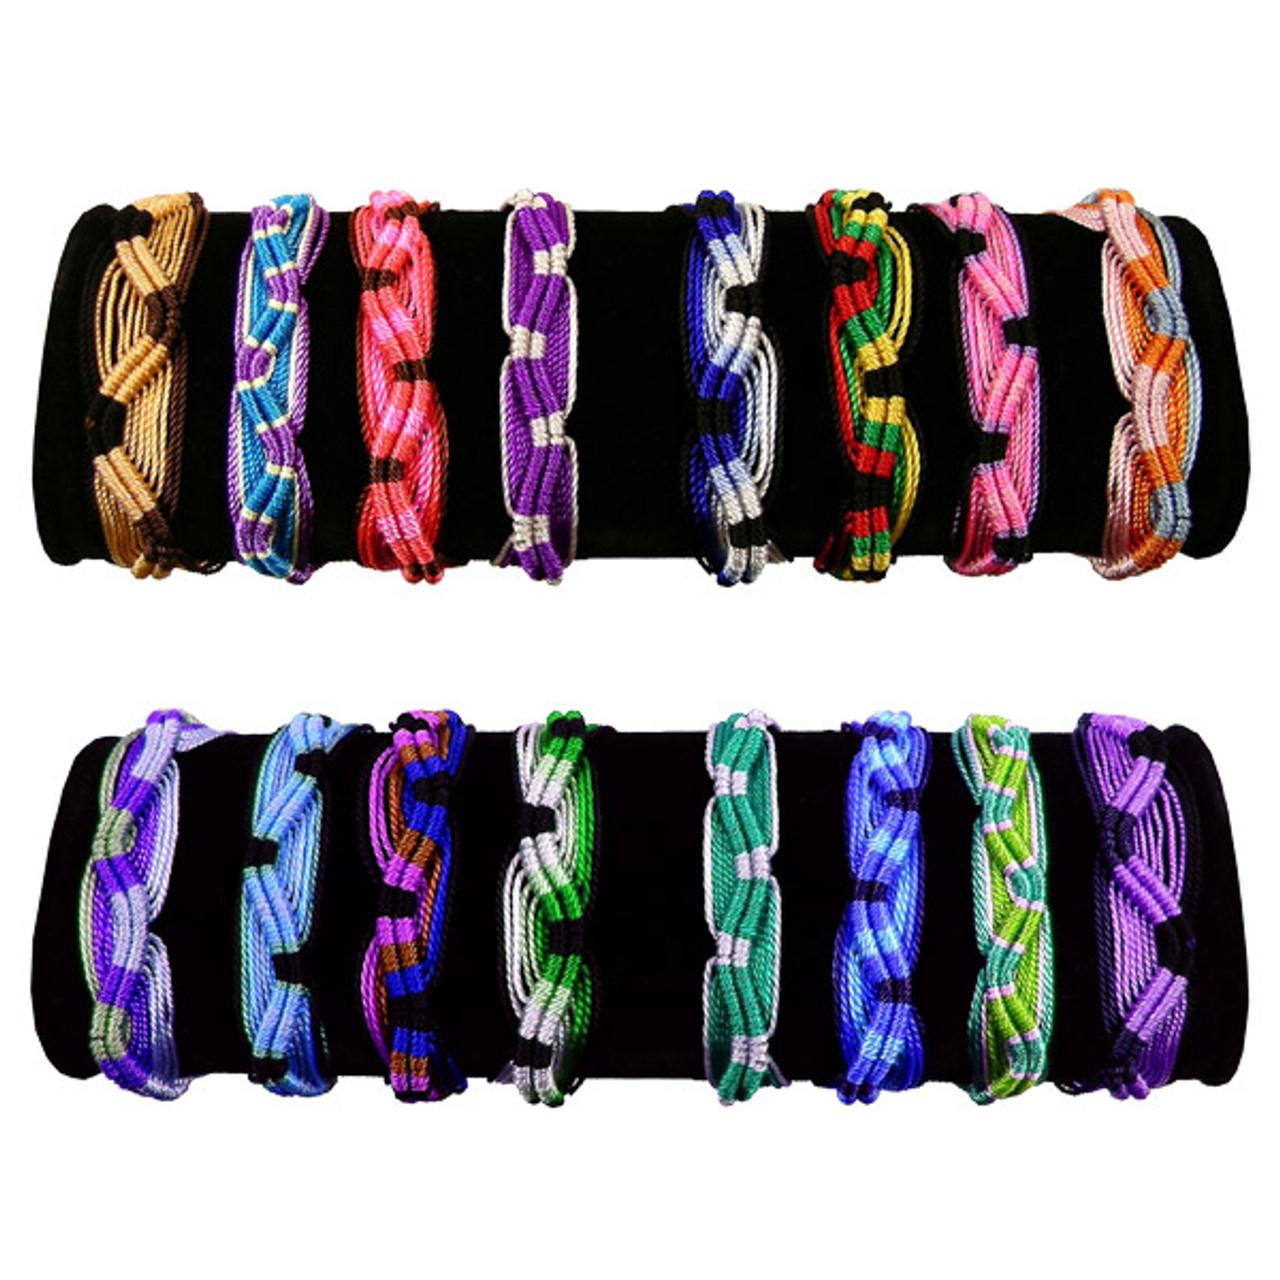 14f5c7c1d936e Friendship Bracelets Wide Lot Mix Bracelet Handcrafted in Peru Acrylic Pack  of 50 Bag Assorted